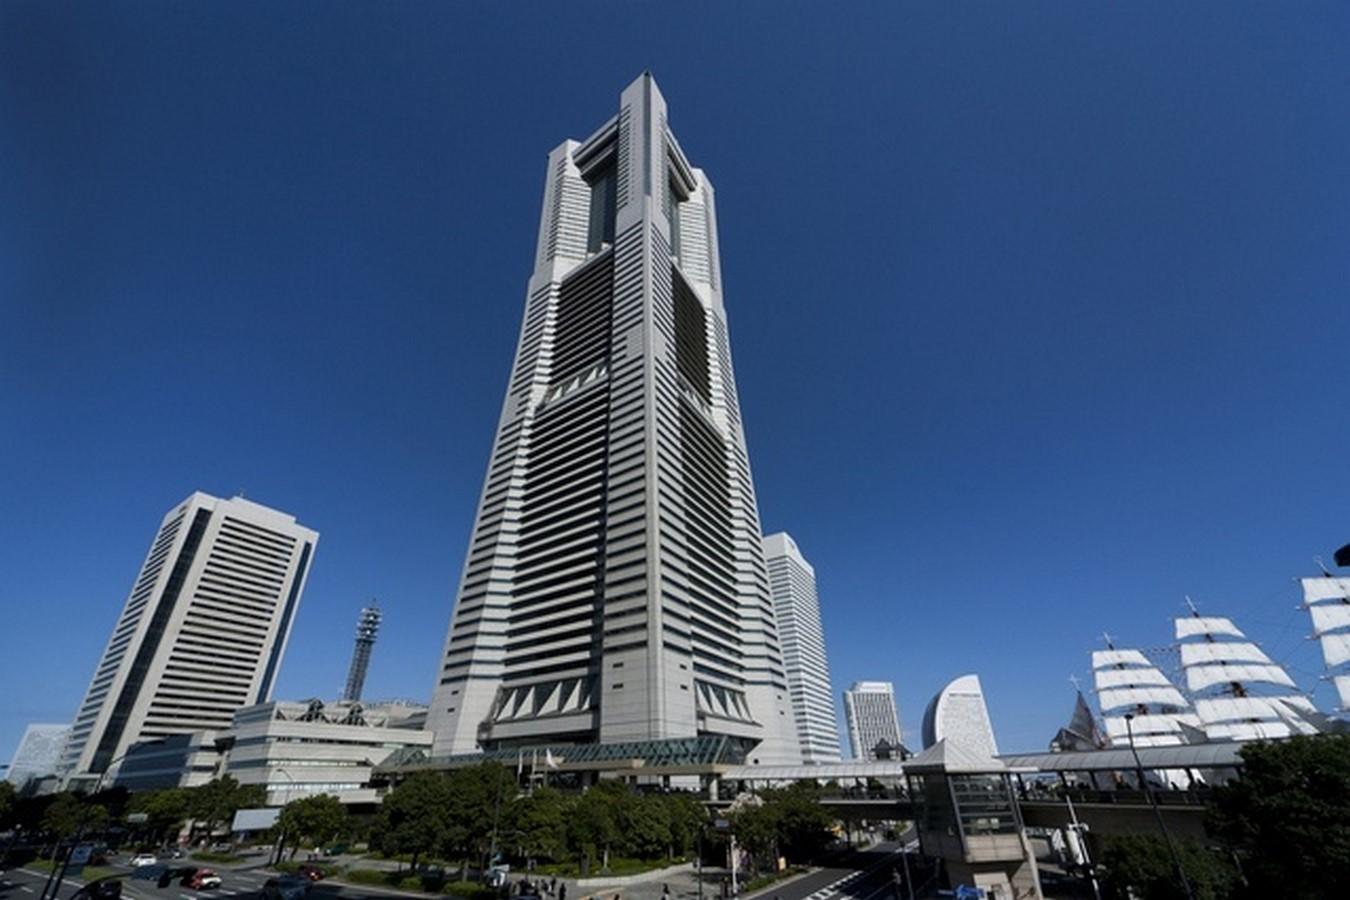 Earthquake Resistant Building Techniques - The Yokohama Landmark Tower - Sheet1